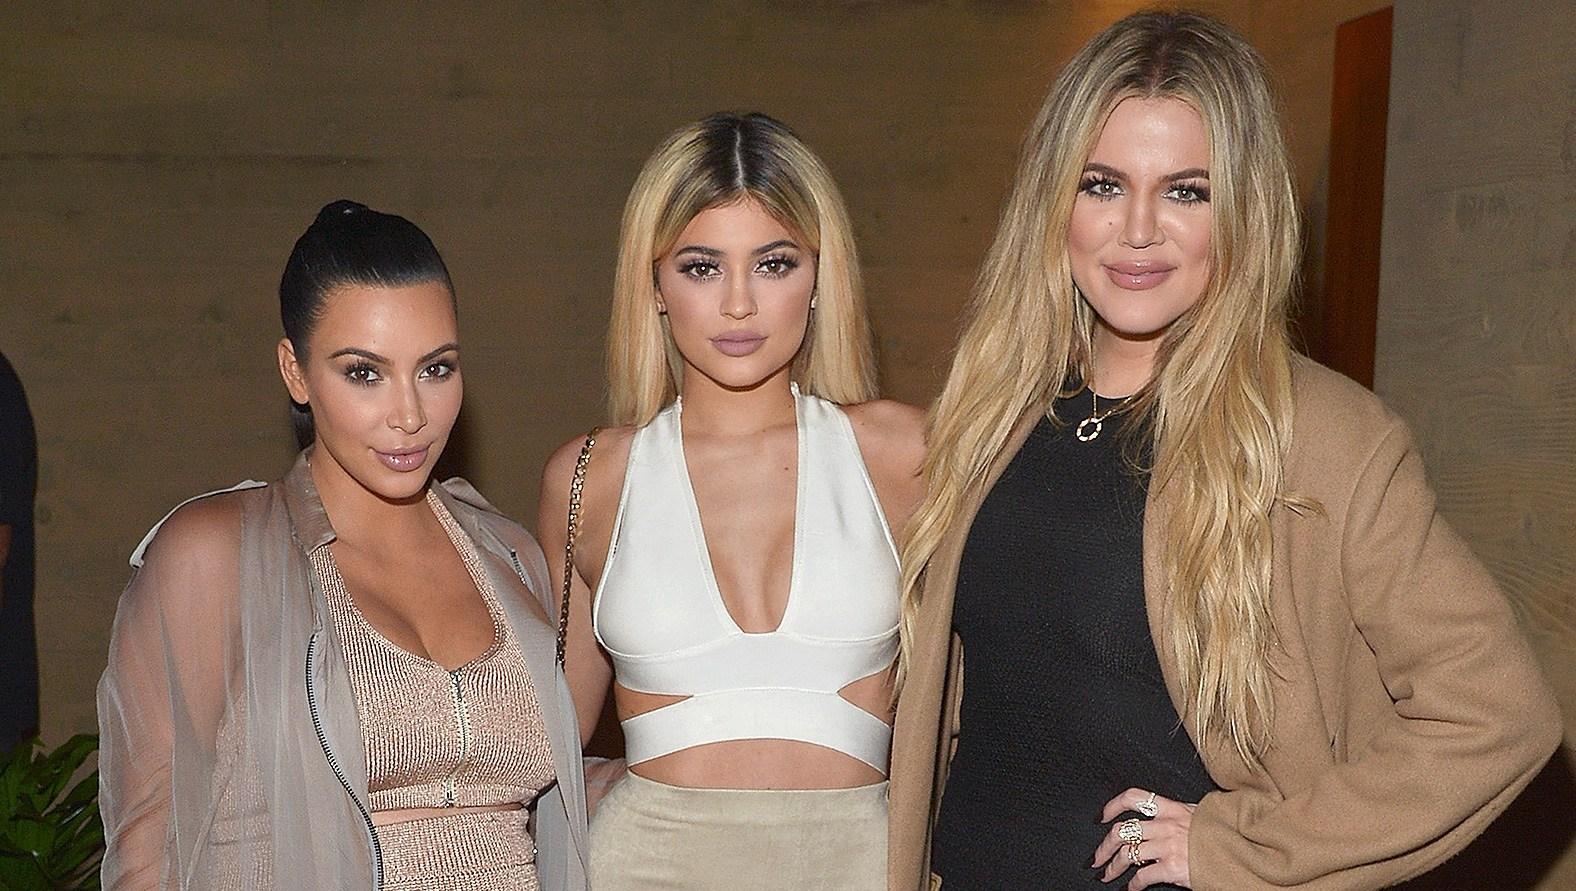 Kim Kardashian West, Kylie Jenner, Khloe Kardashian, Cousins